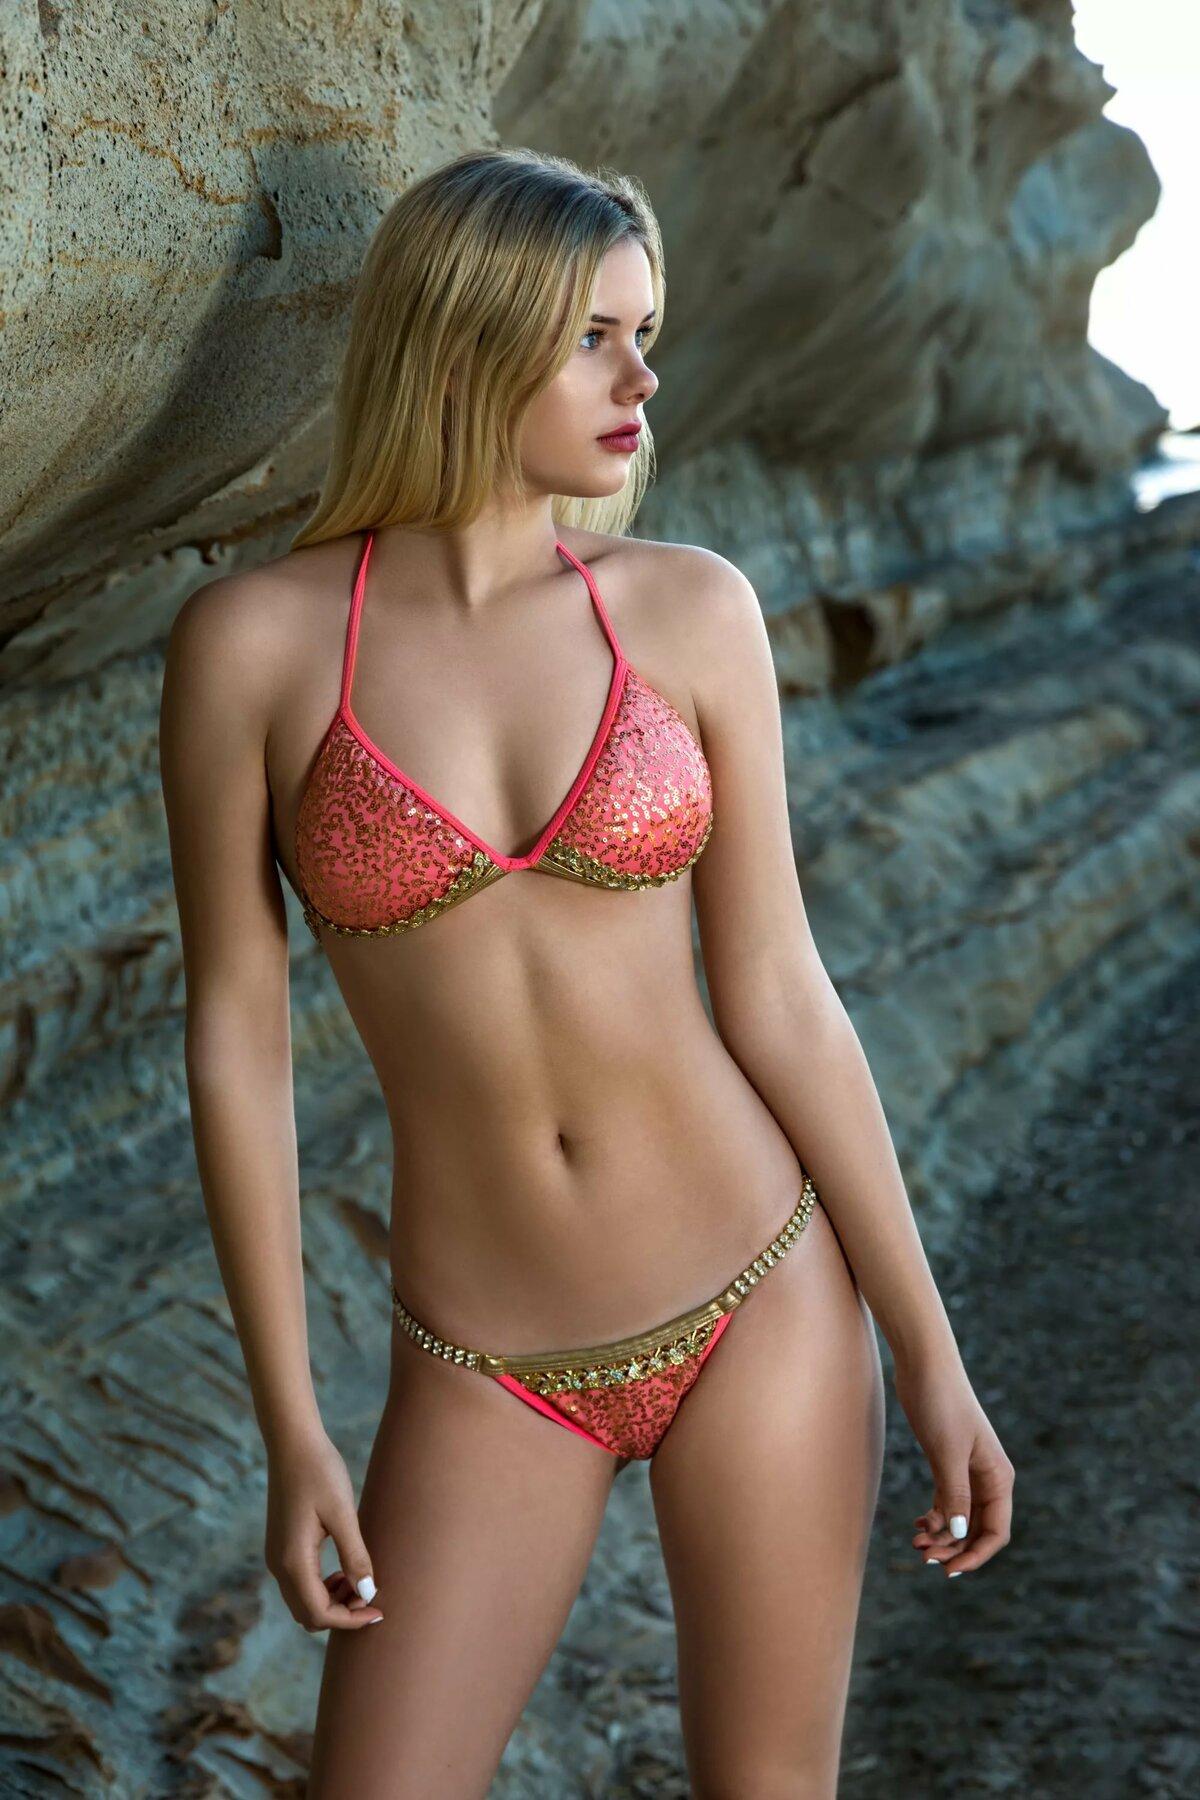 Bikini model murder